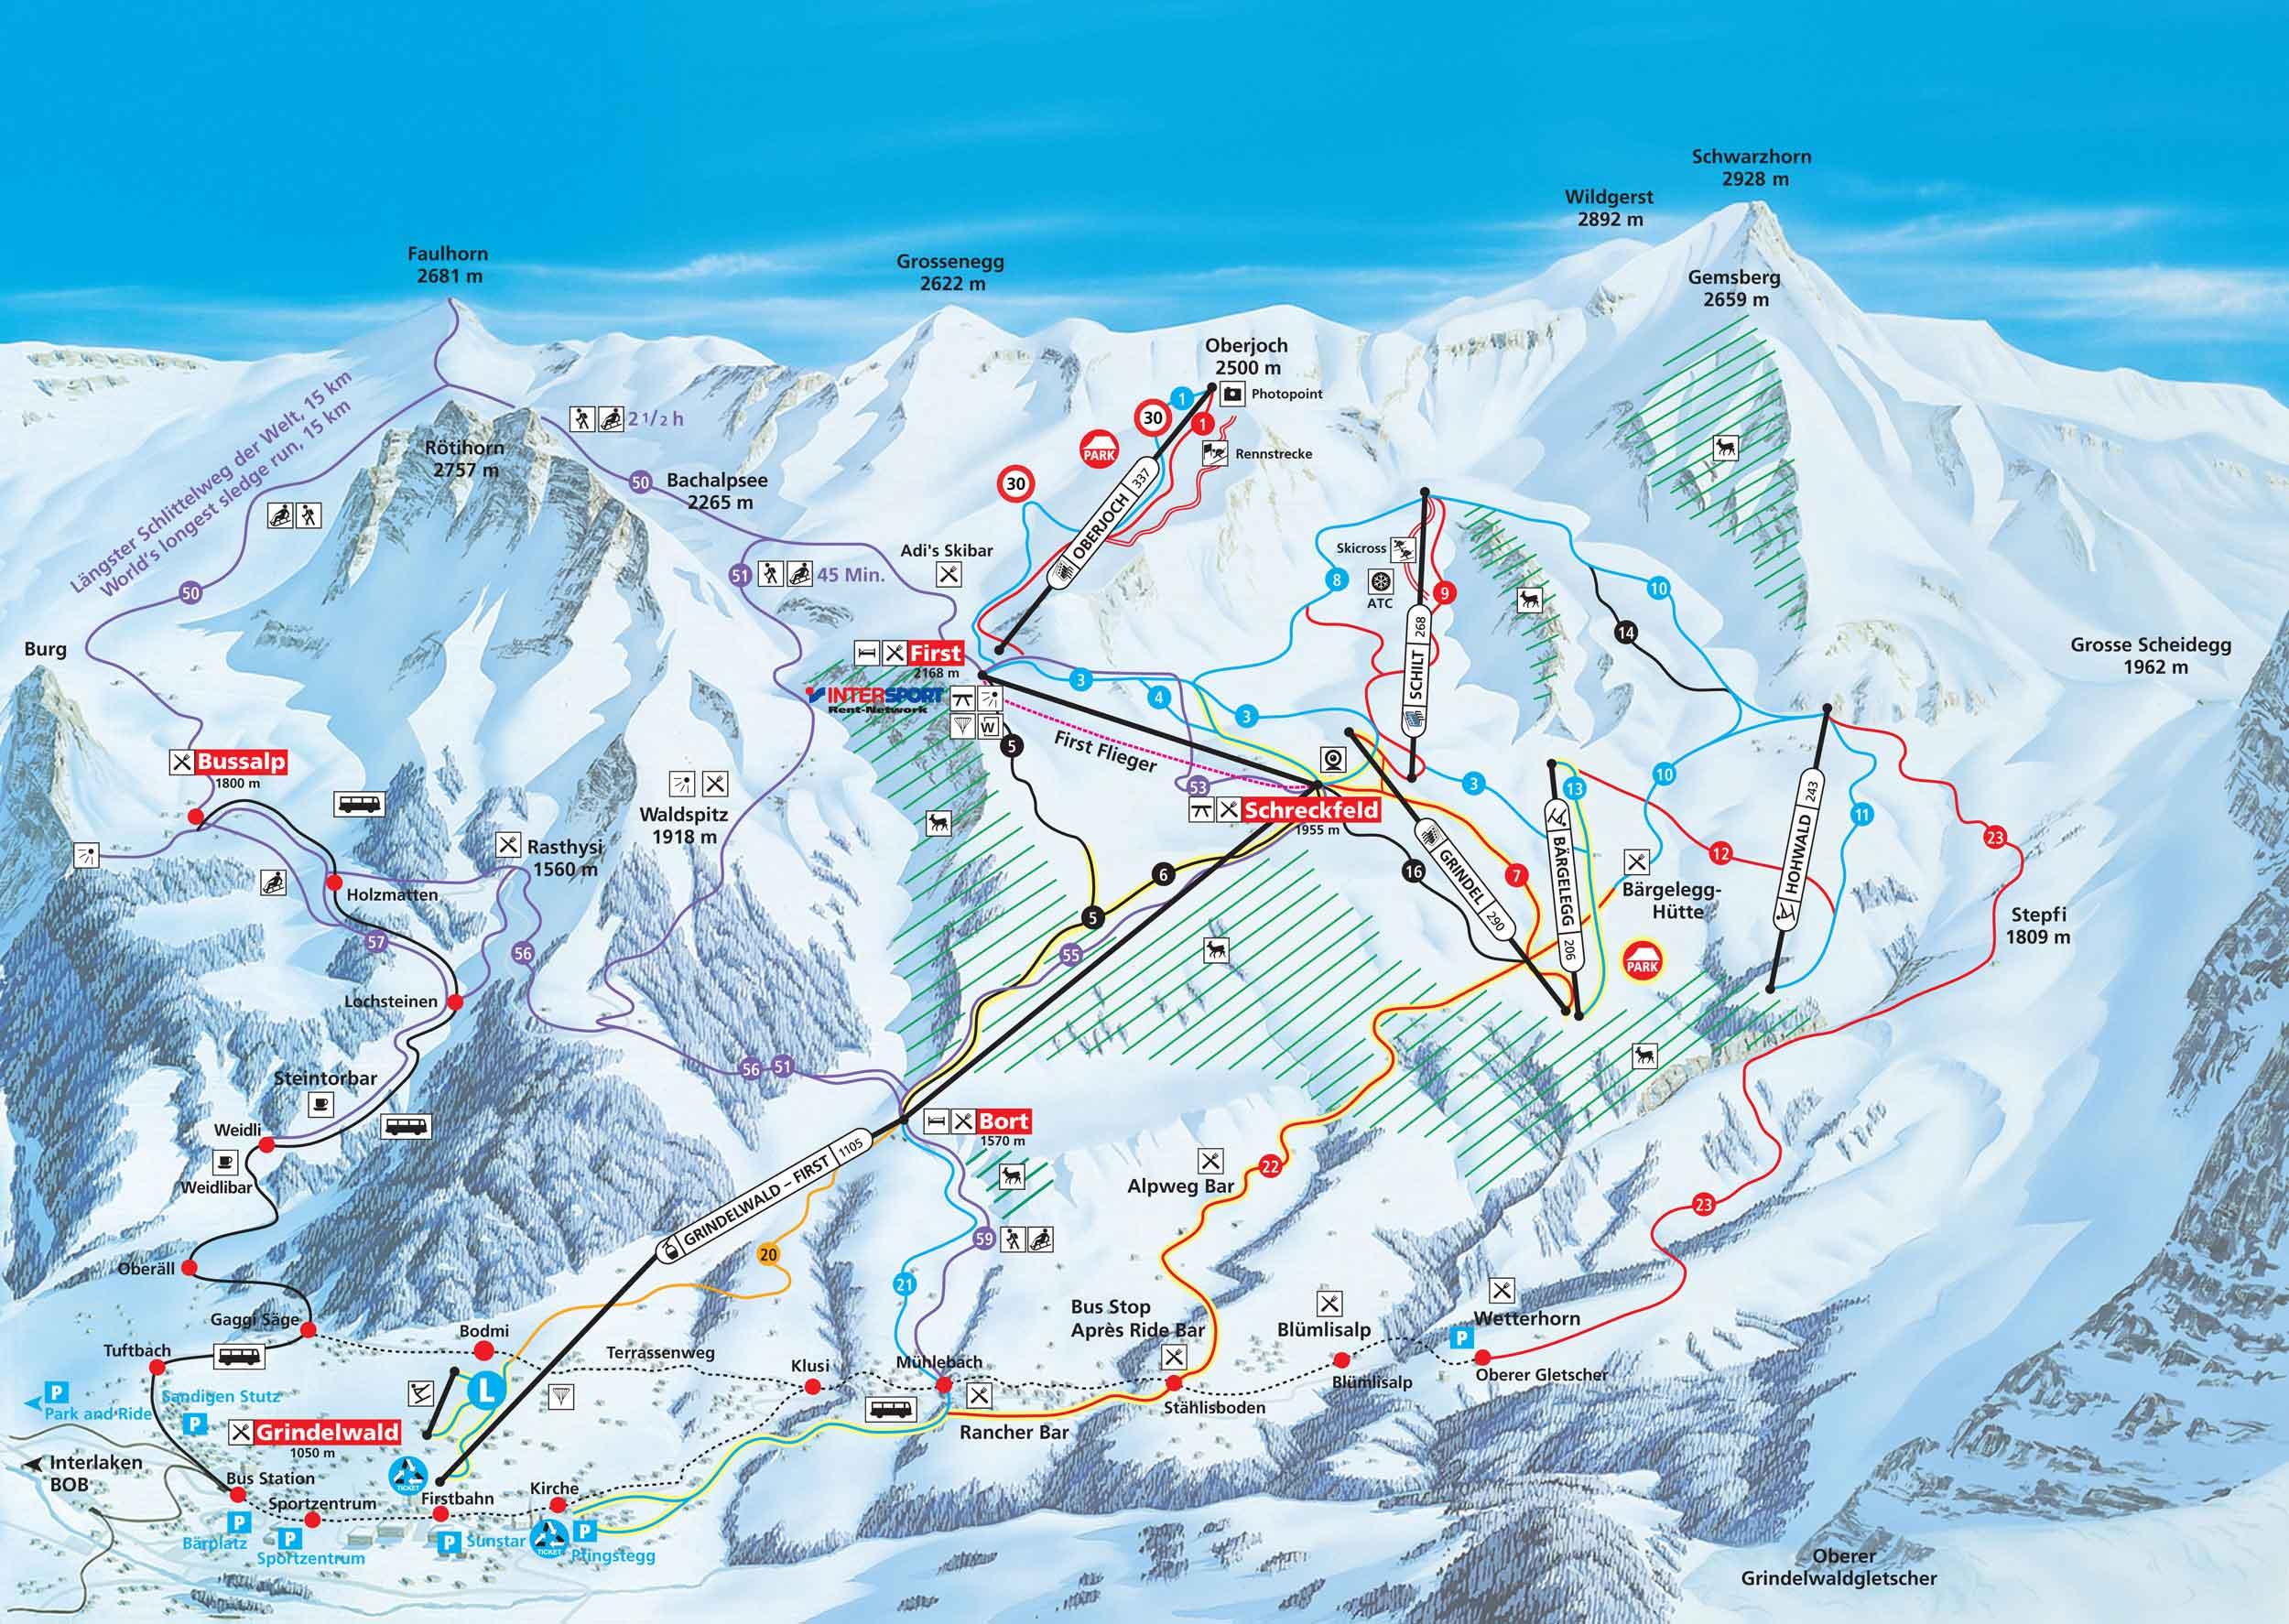 Ski Map Jungfrau Region Switzerland